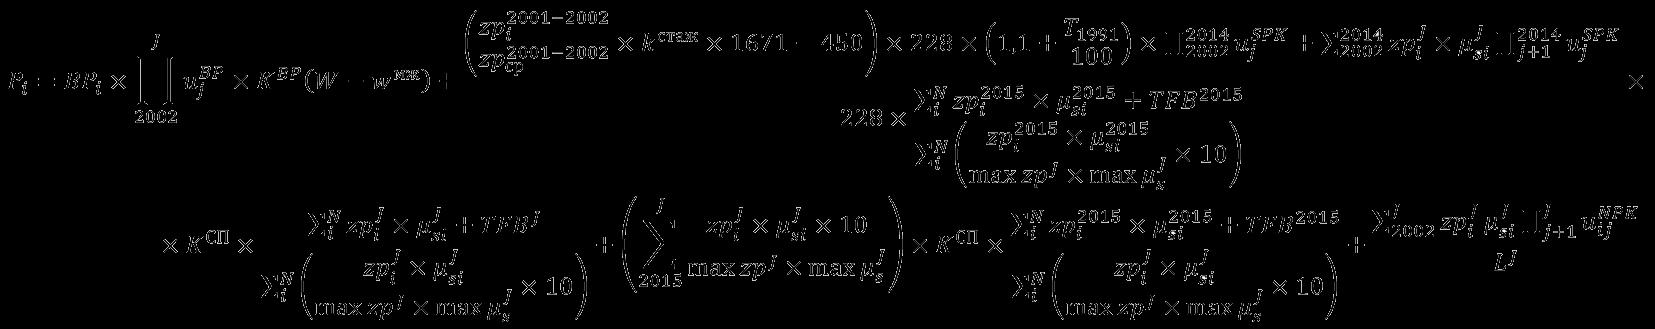 Картинка: Общая формула расчета пенсии